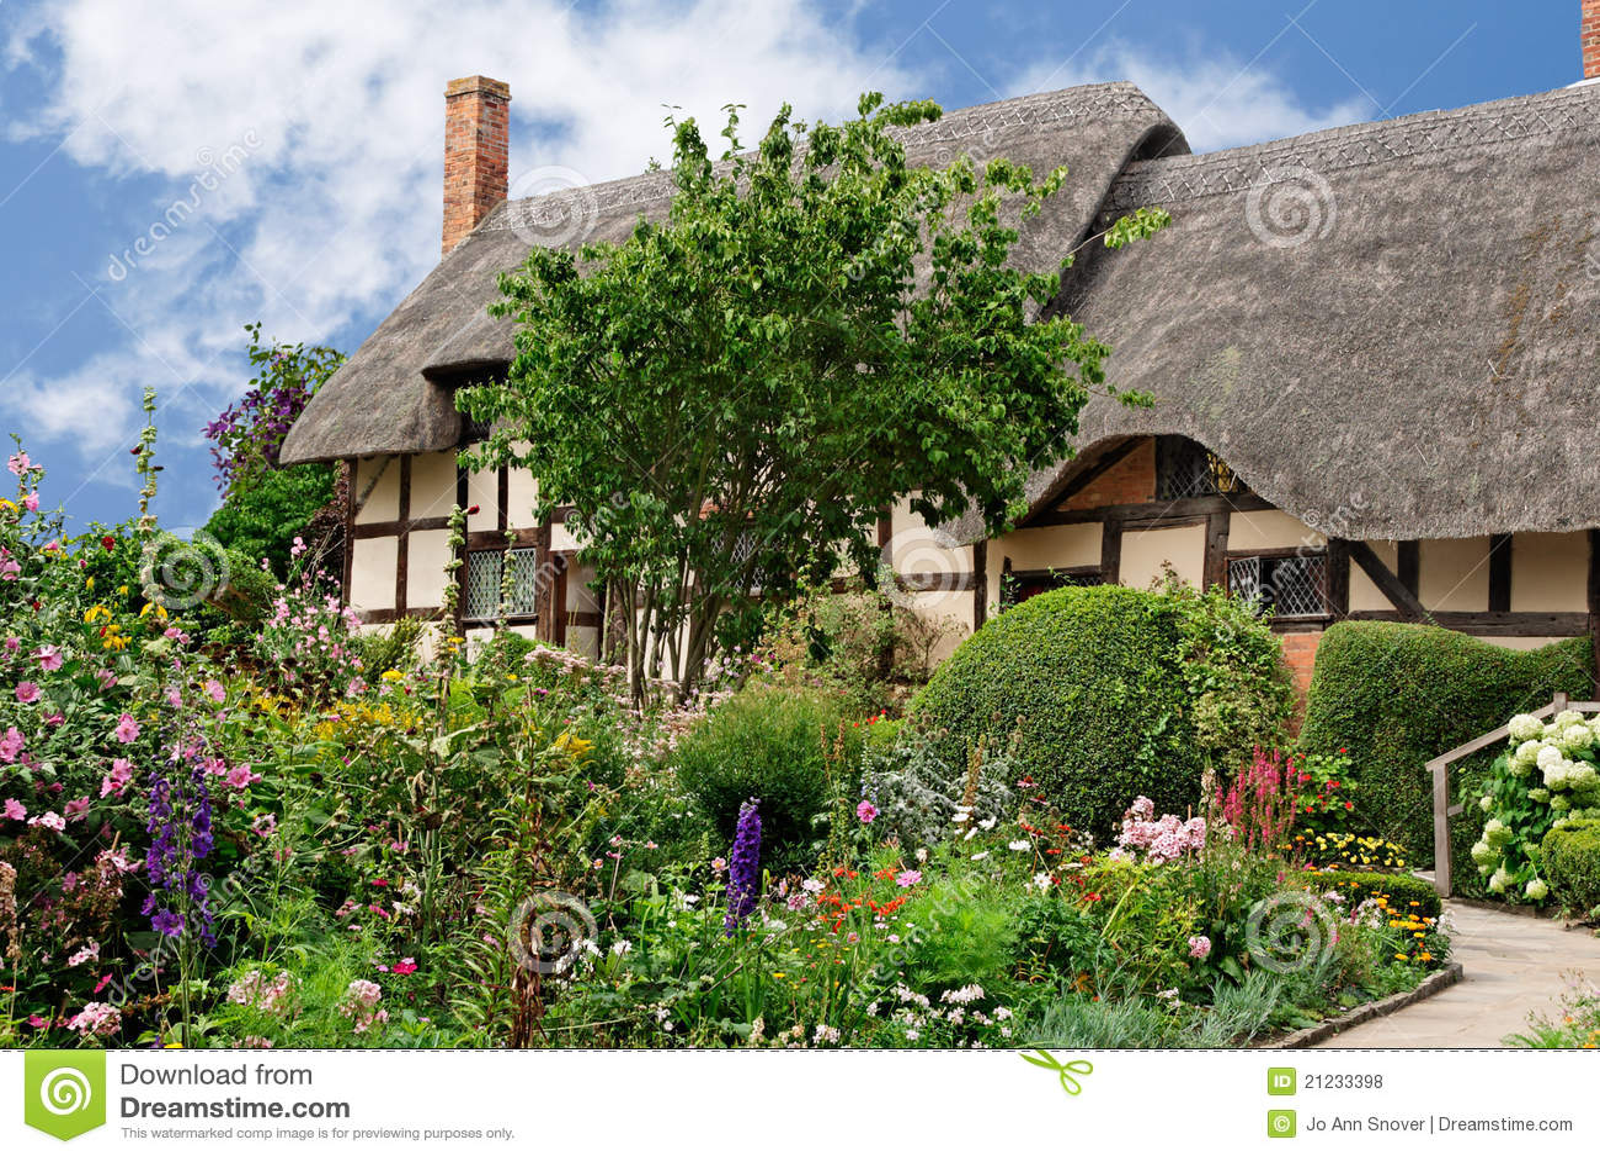 Summer Cottage Garden Royalty Free Stock Photos Image